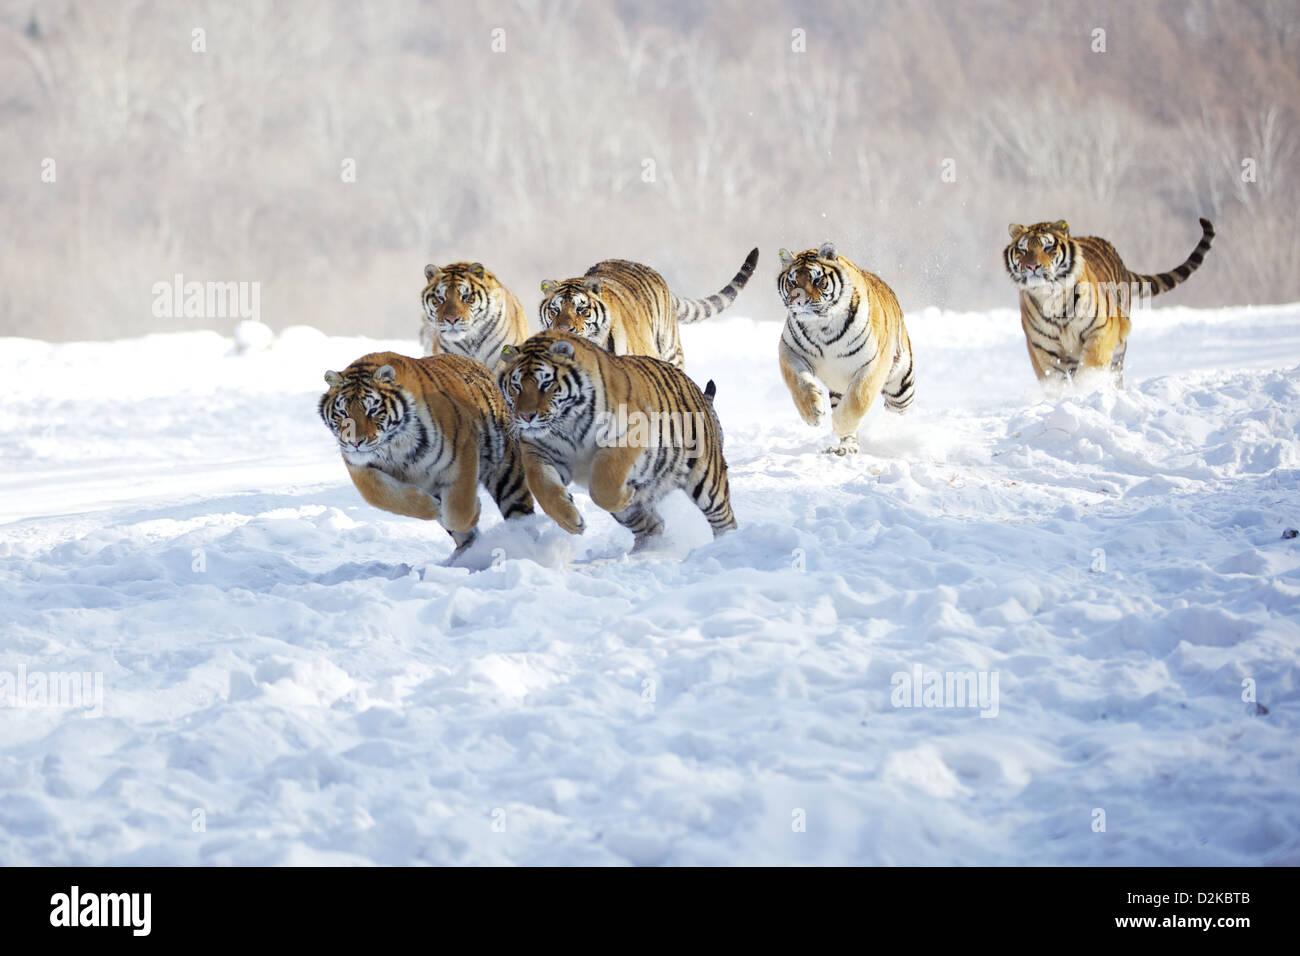 Siberian tigers Crouching Tiger - Stock Image